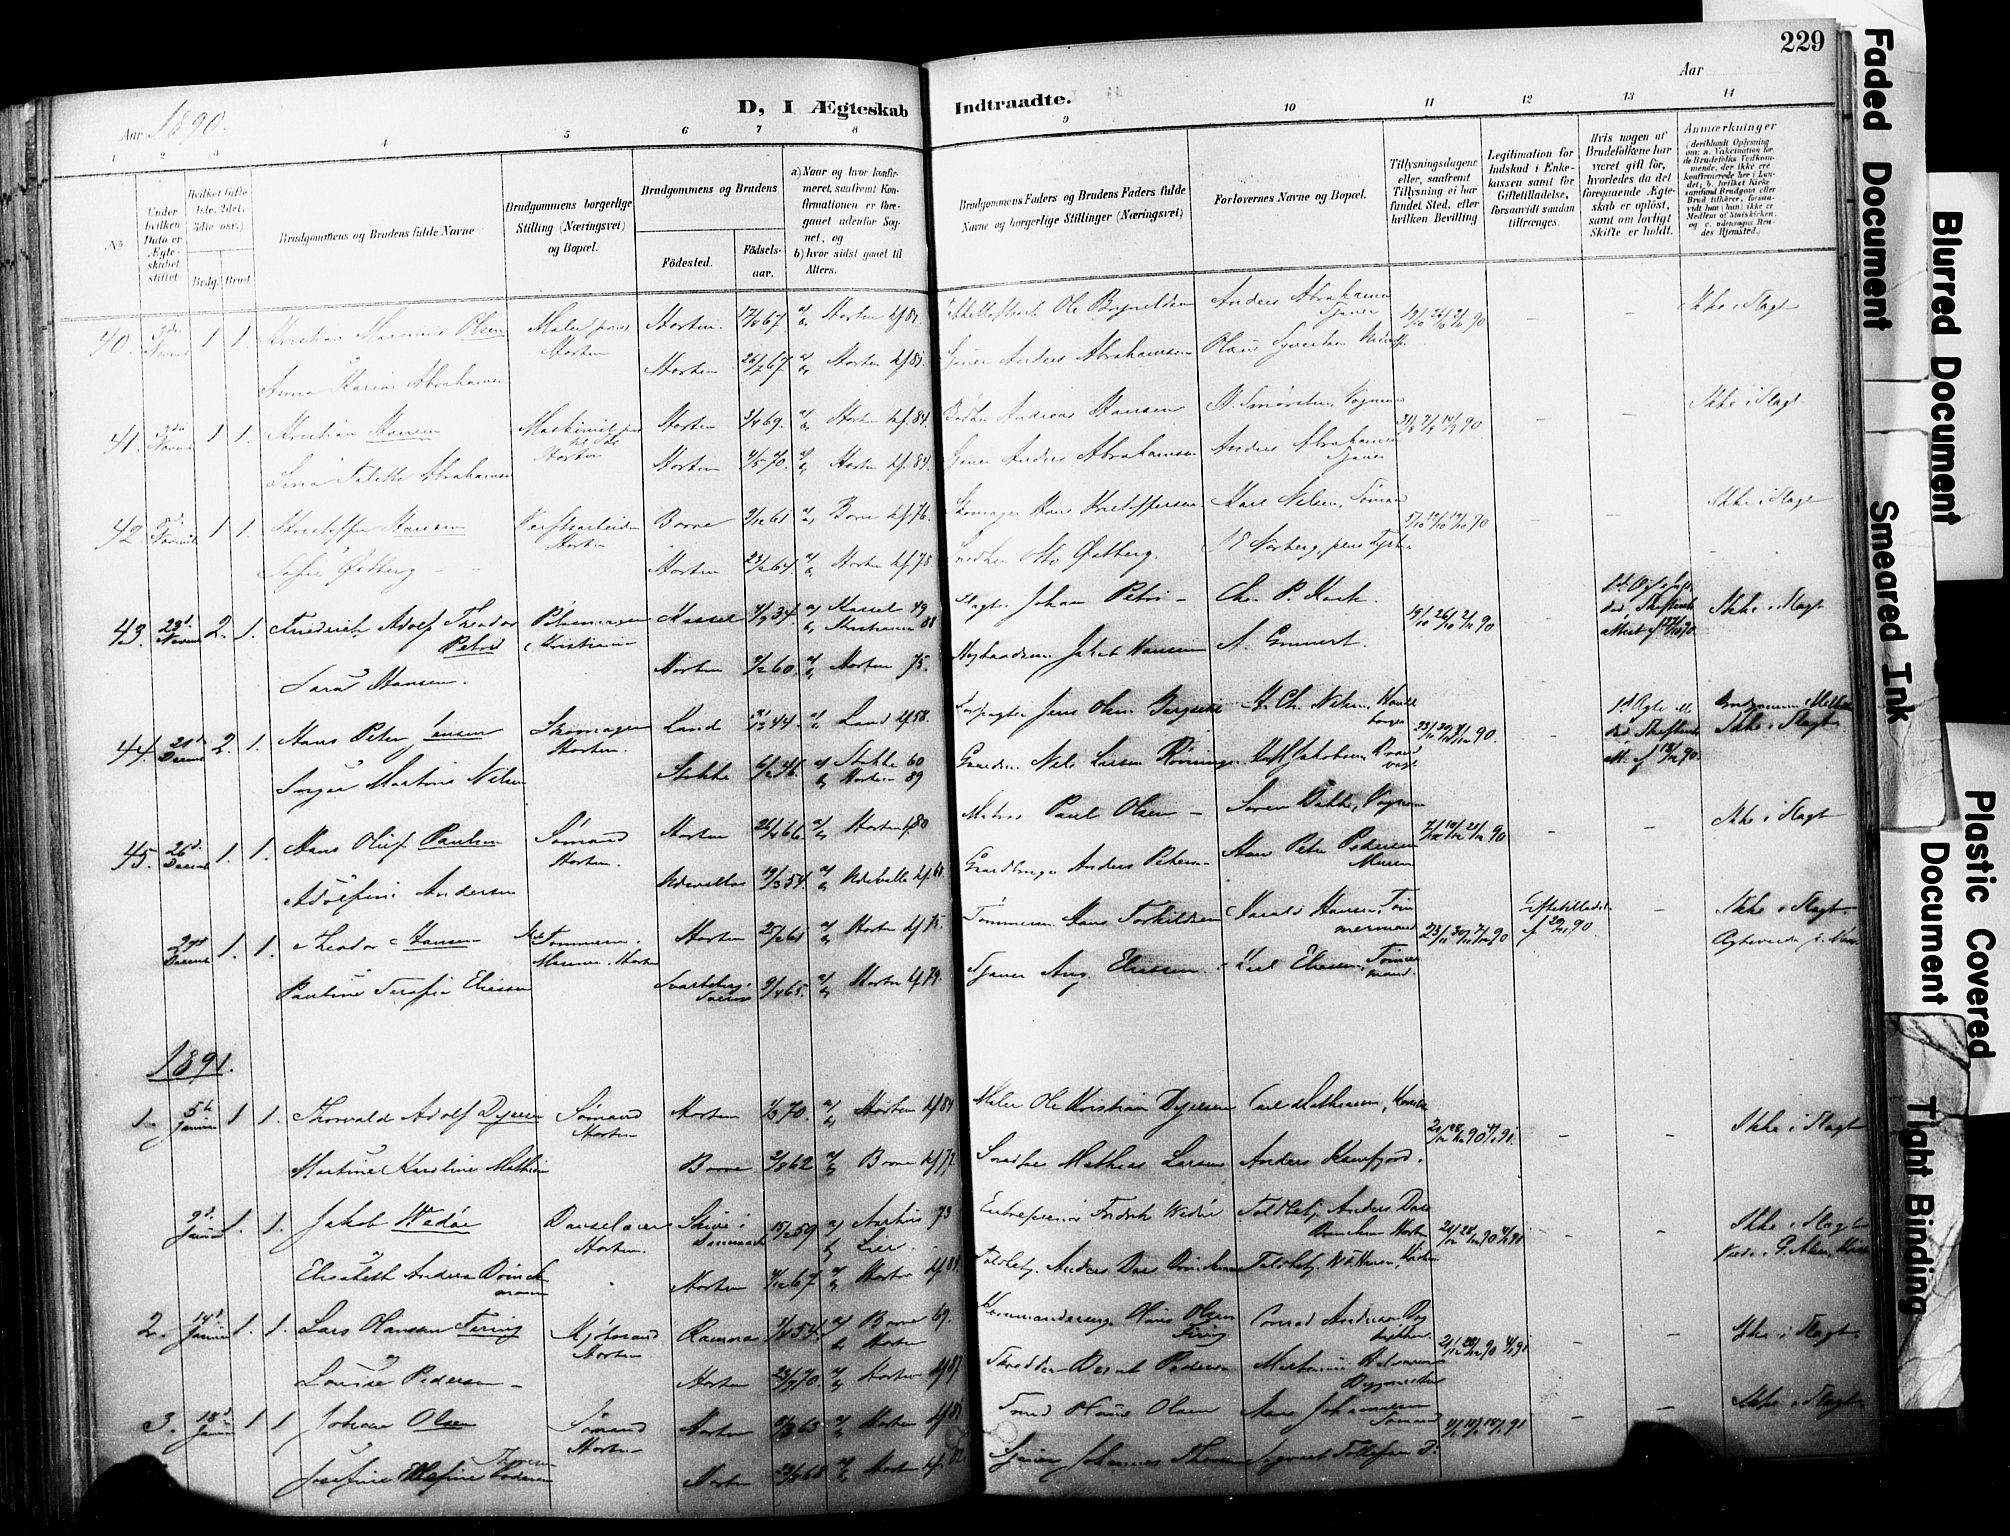 SAKO, Horten kirkebøker, F/Fa/L0004: Parish register (official) no. 4, 1888-1895, p. 229